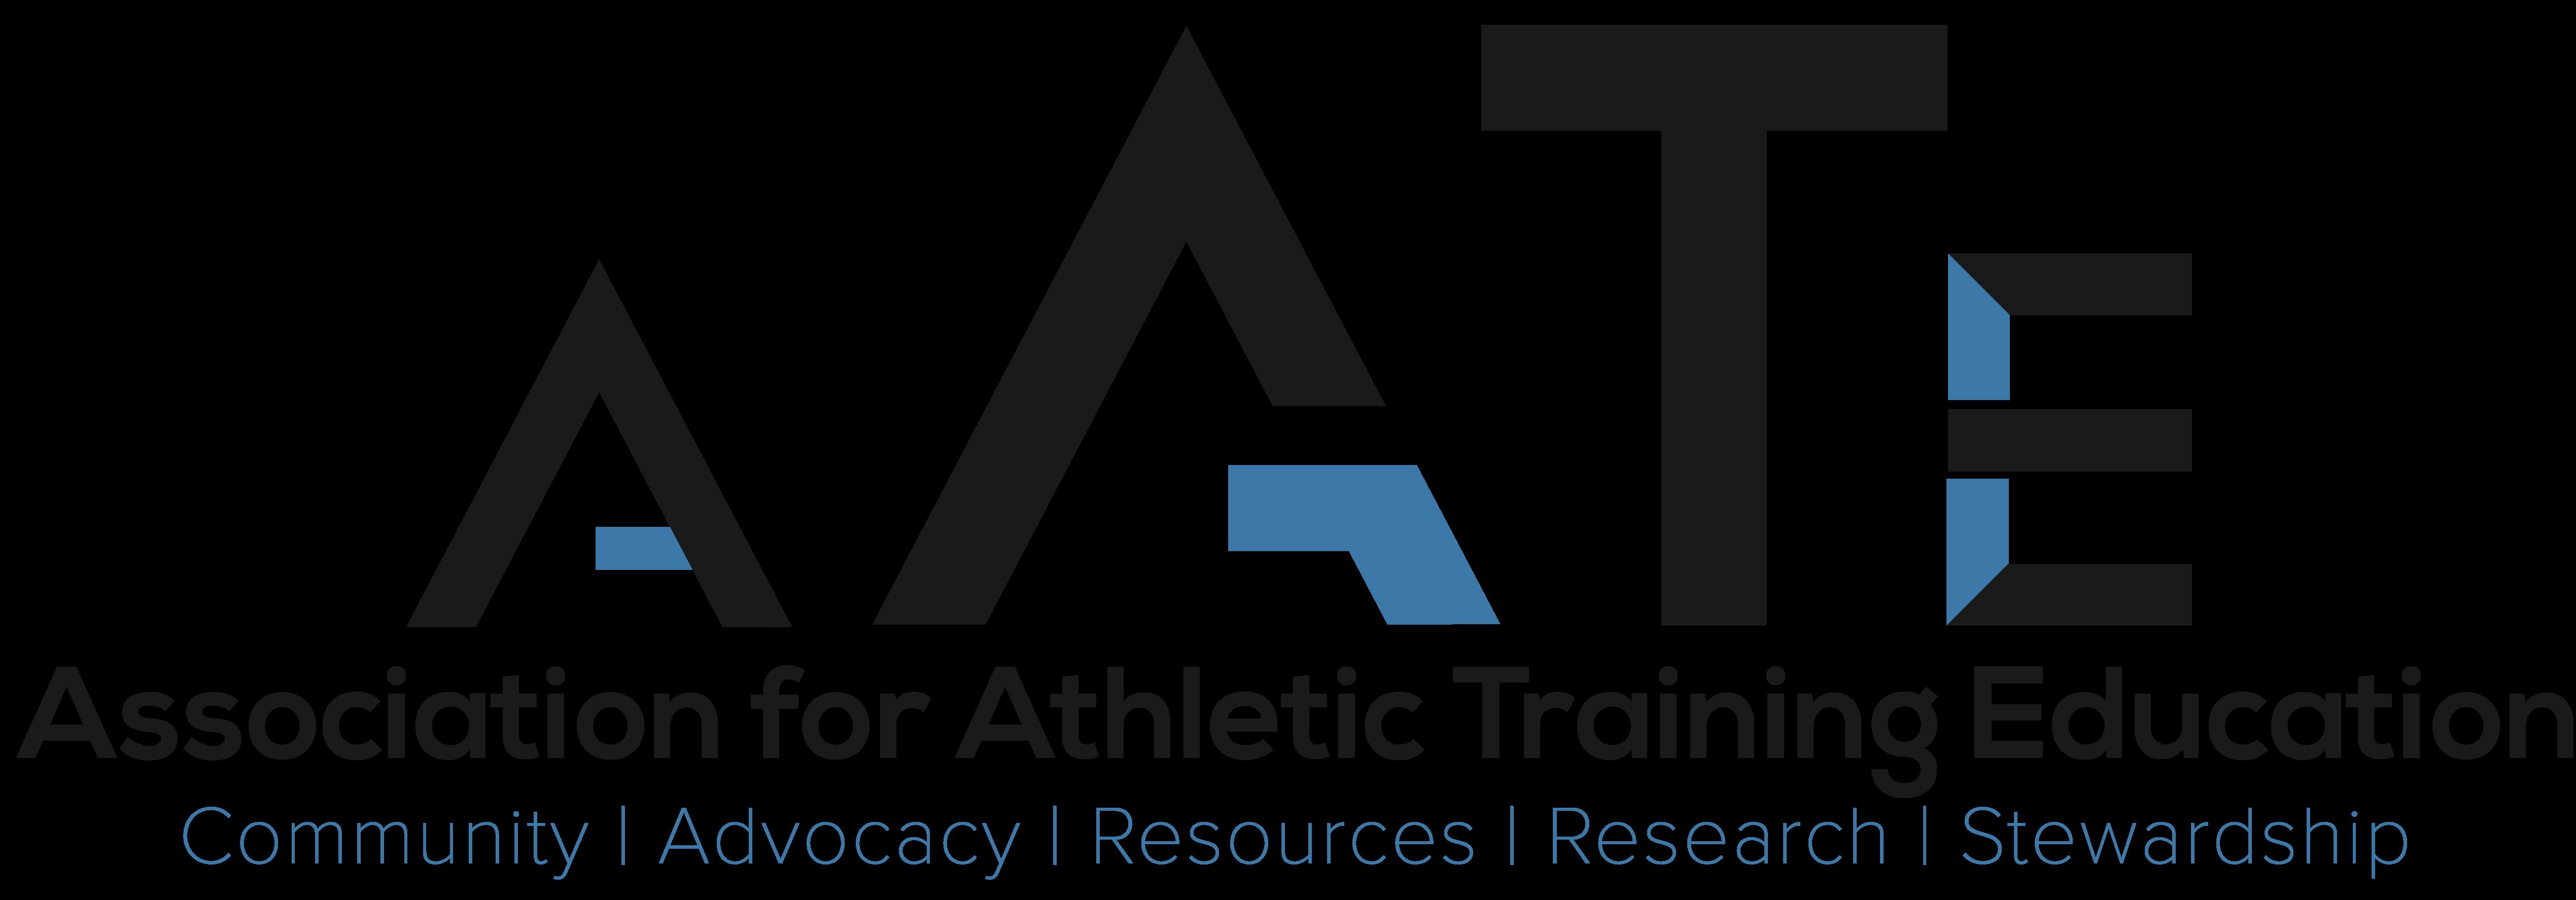 Association for Athletic Training Education